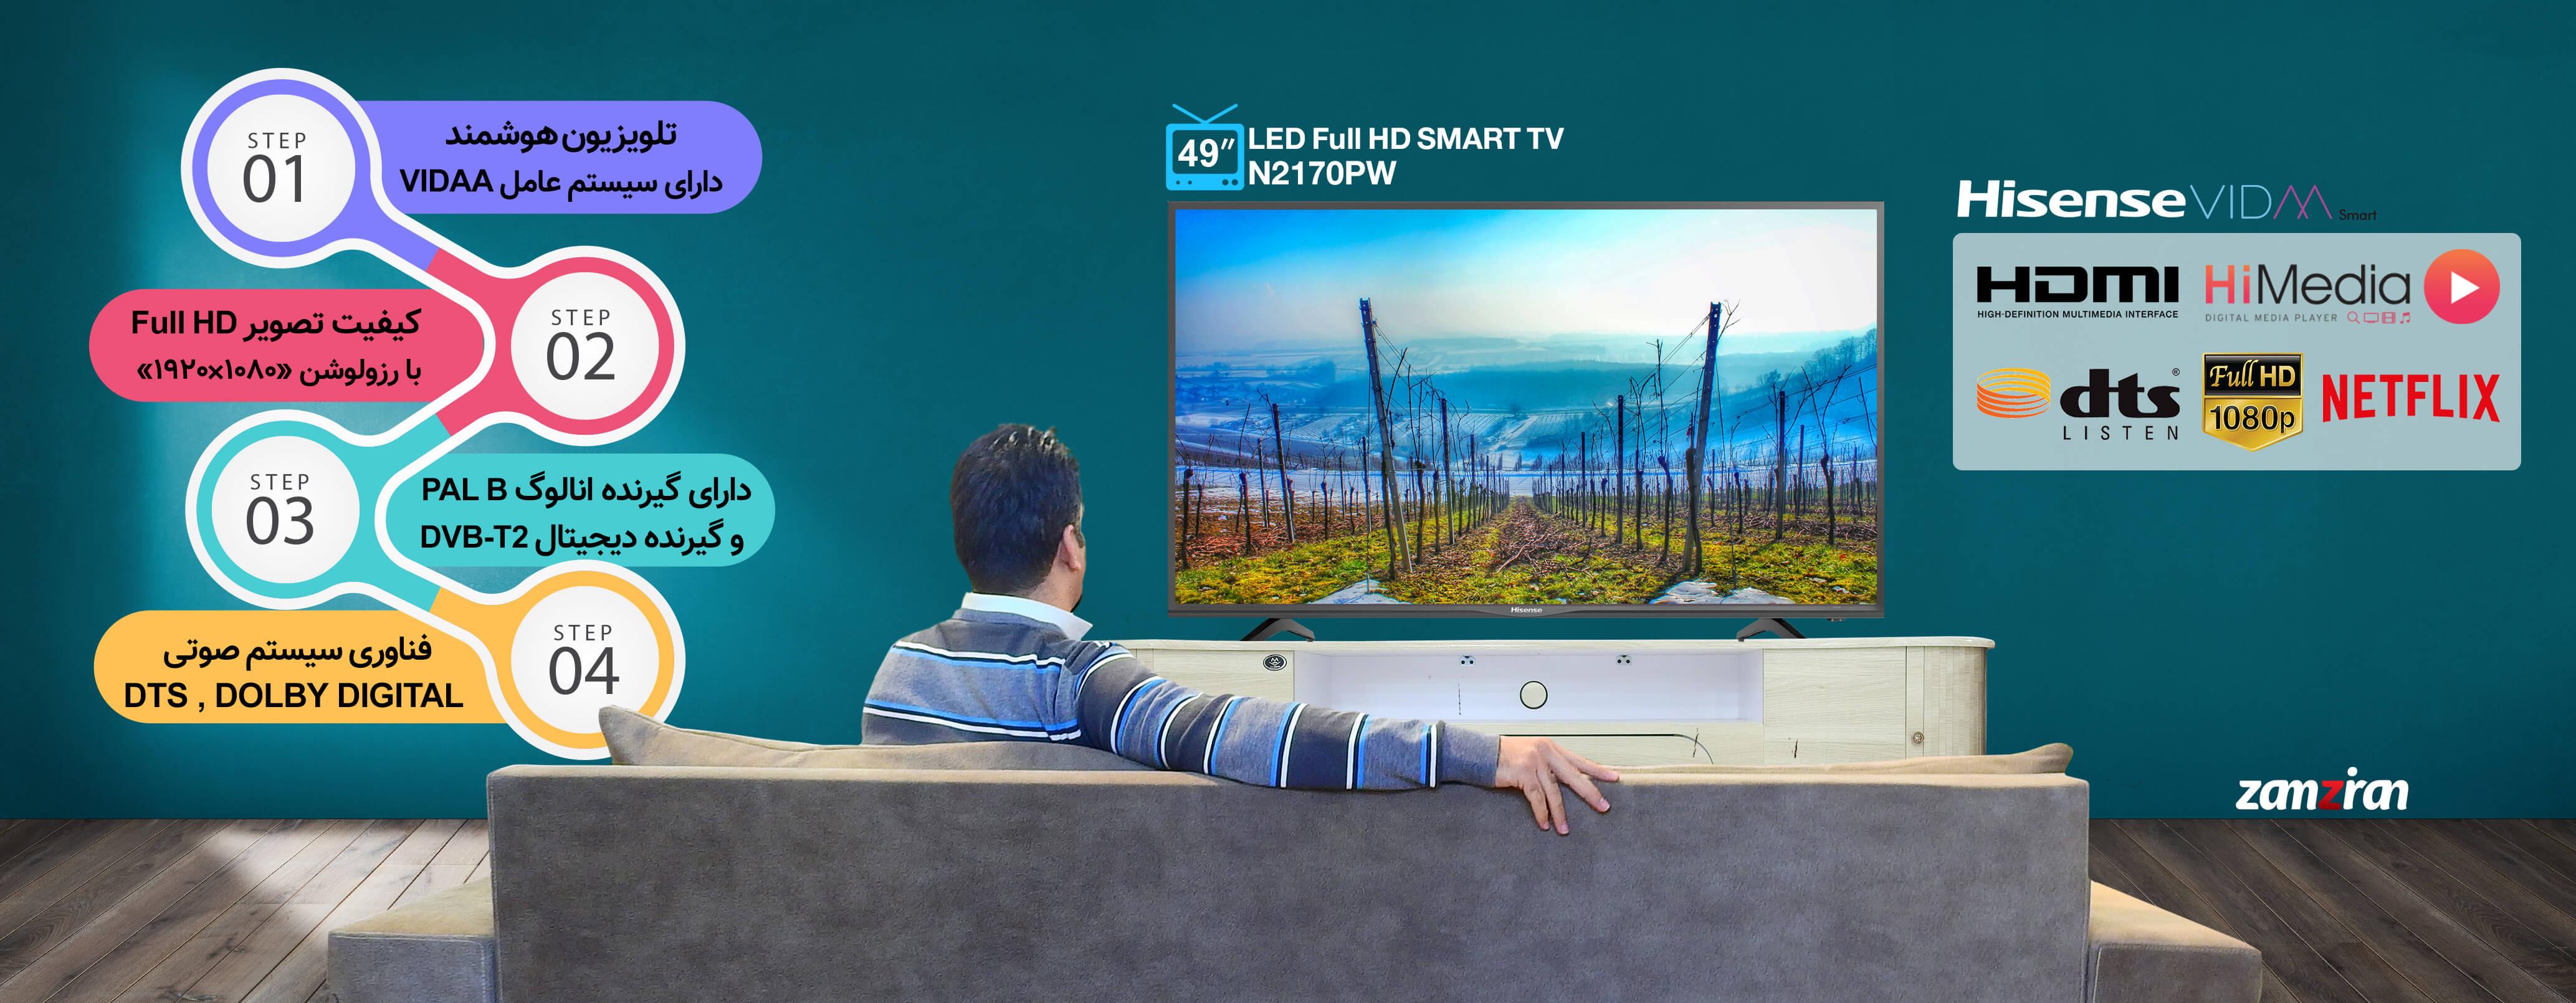 اینفوگرافی تلویزیون هوشمند هایسنس N2170PW